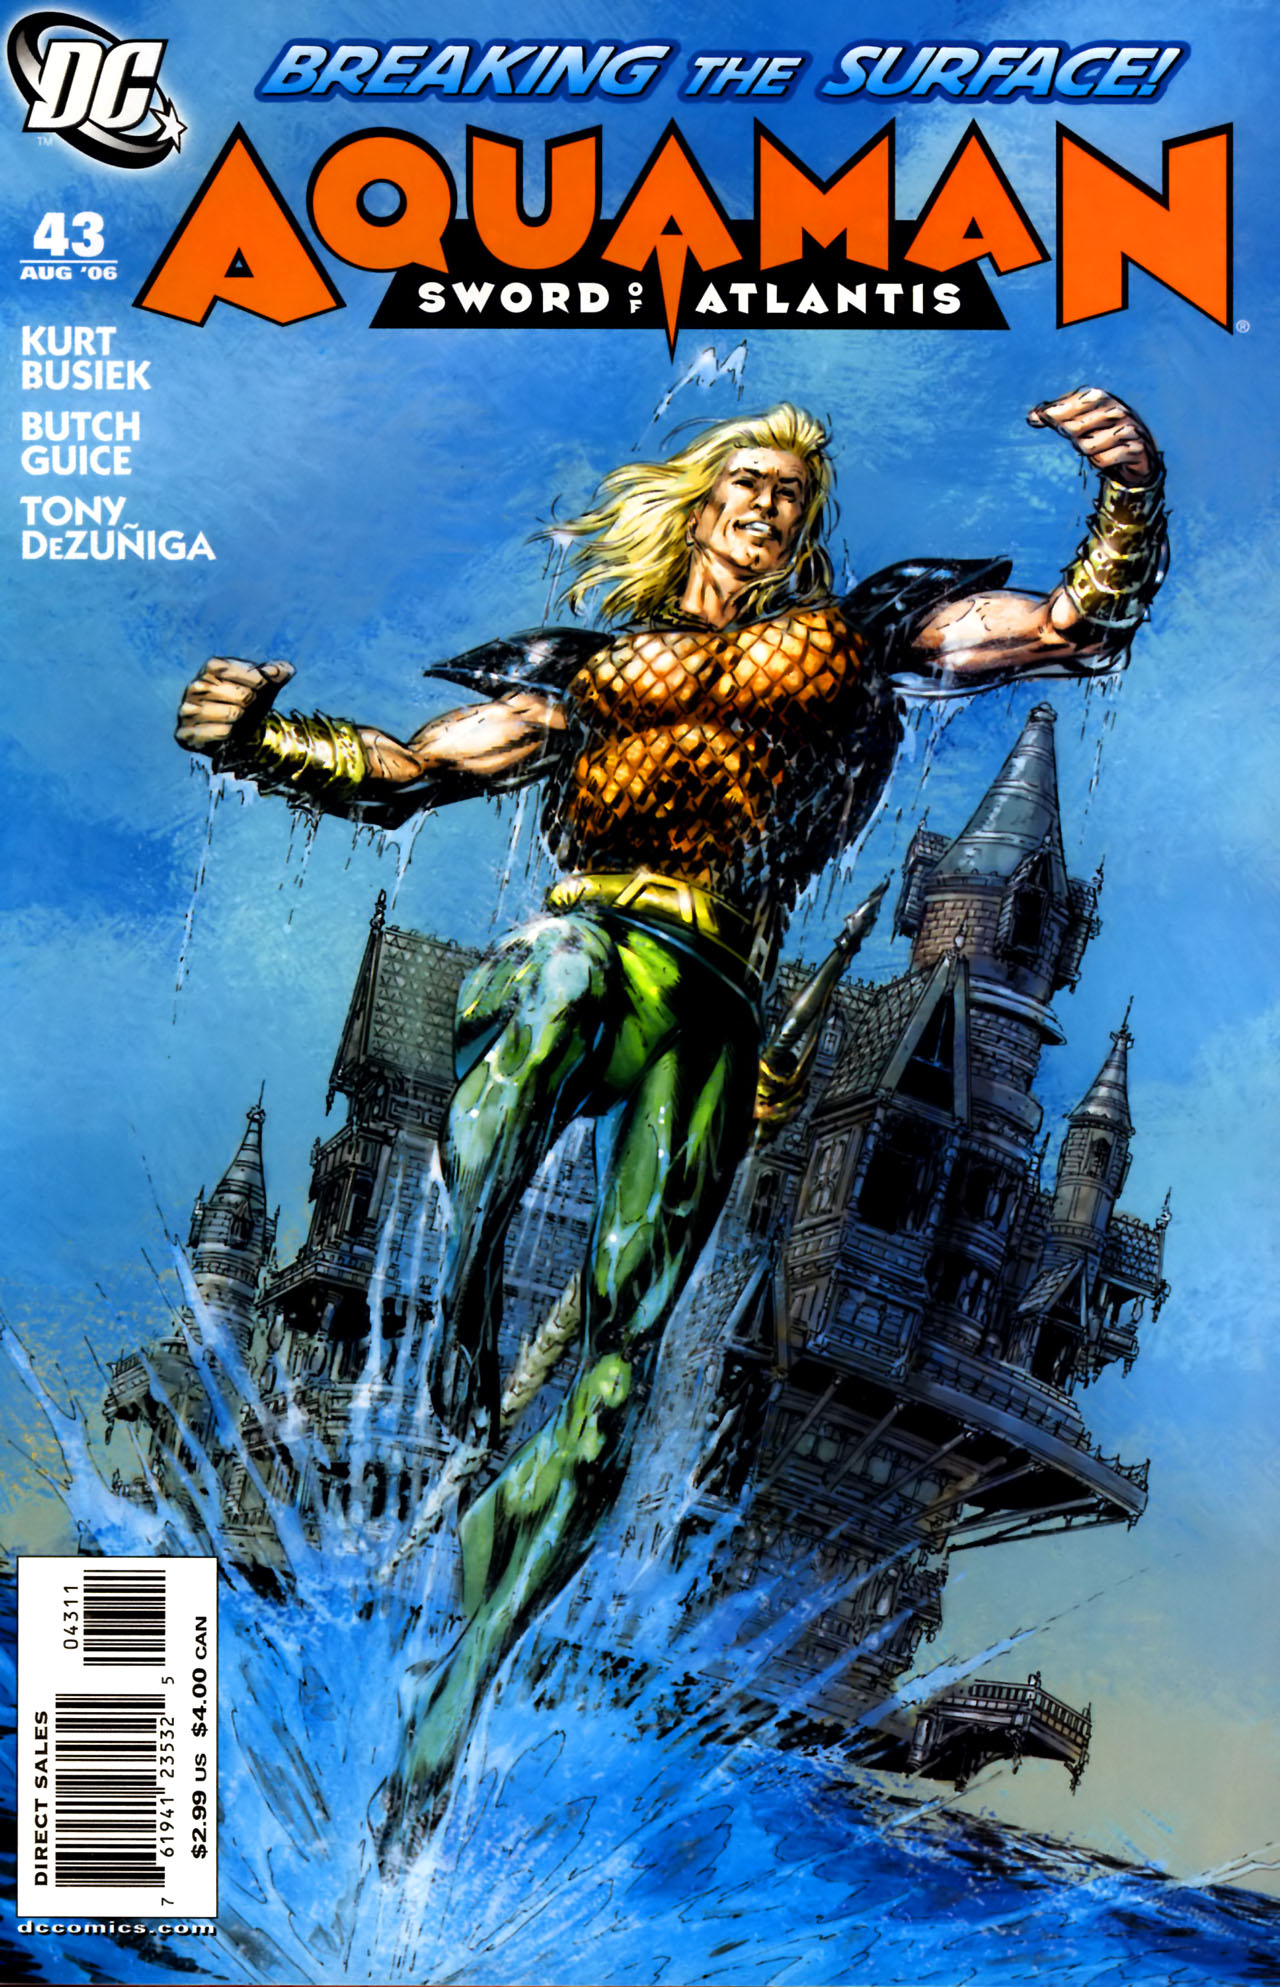 Aquaman: Sword of Atlantis 43 Page 1